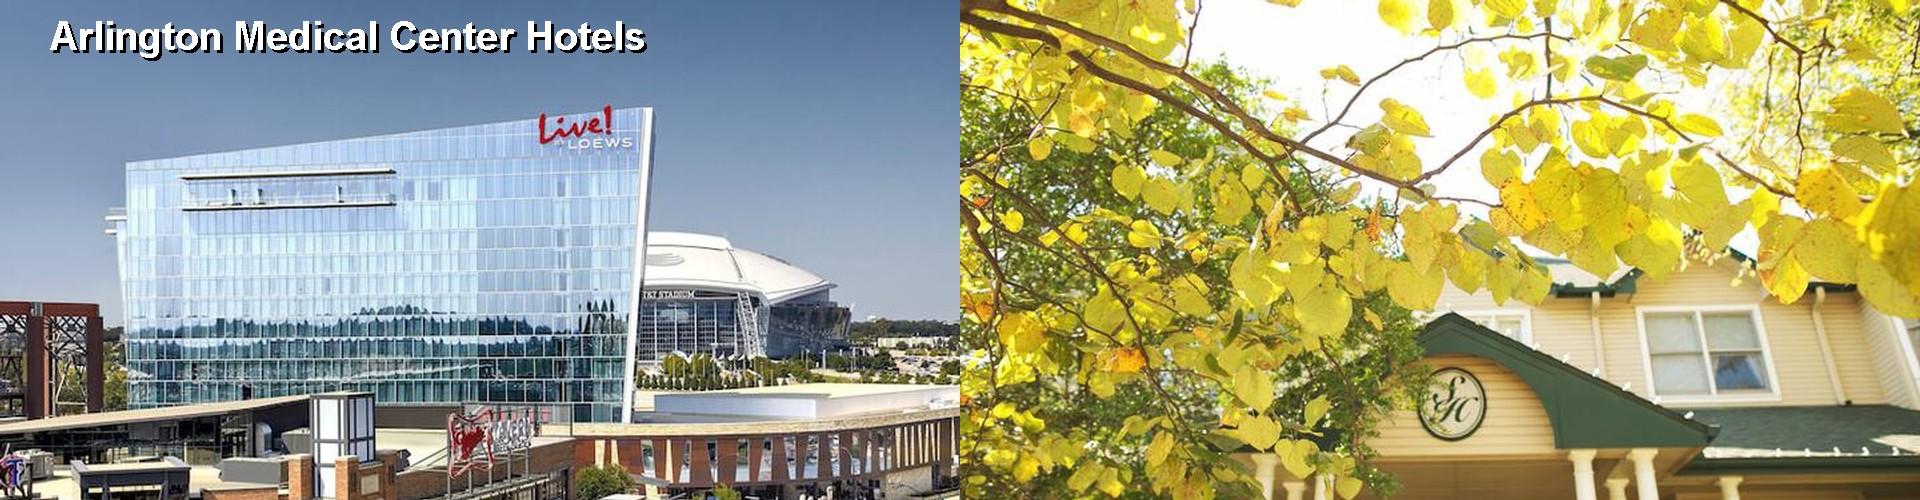 5 Best Hotels Near Arlington Medical Center